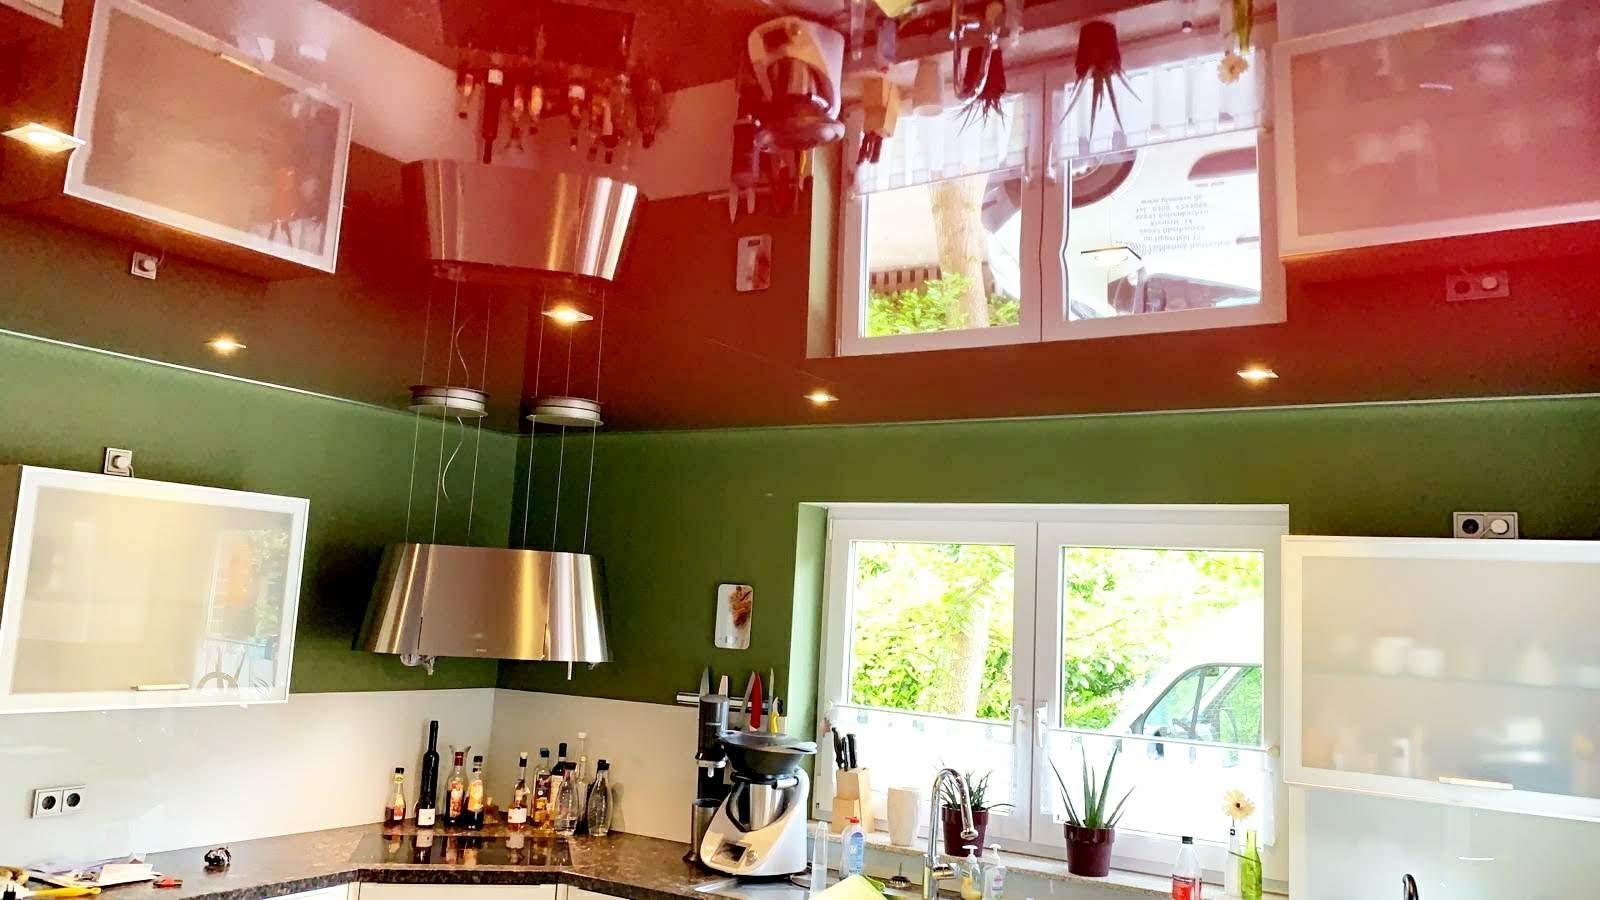 farbige Küchendecke Plameco Spanndecke in rot